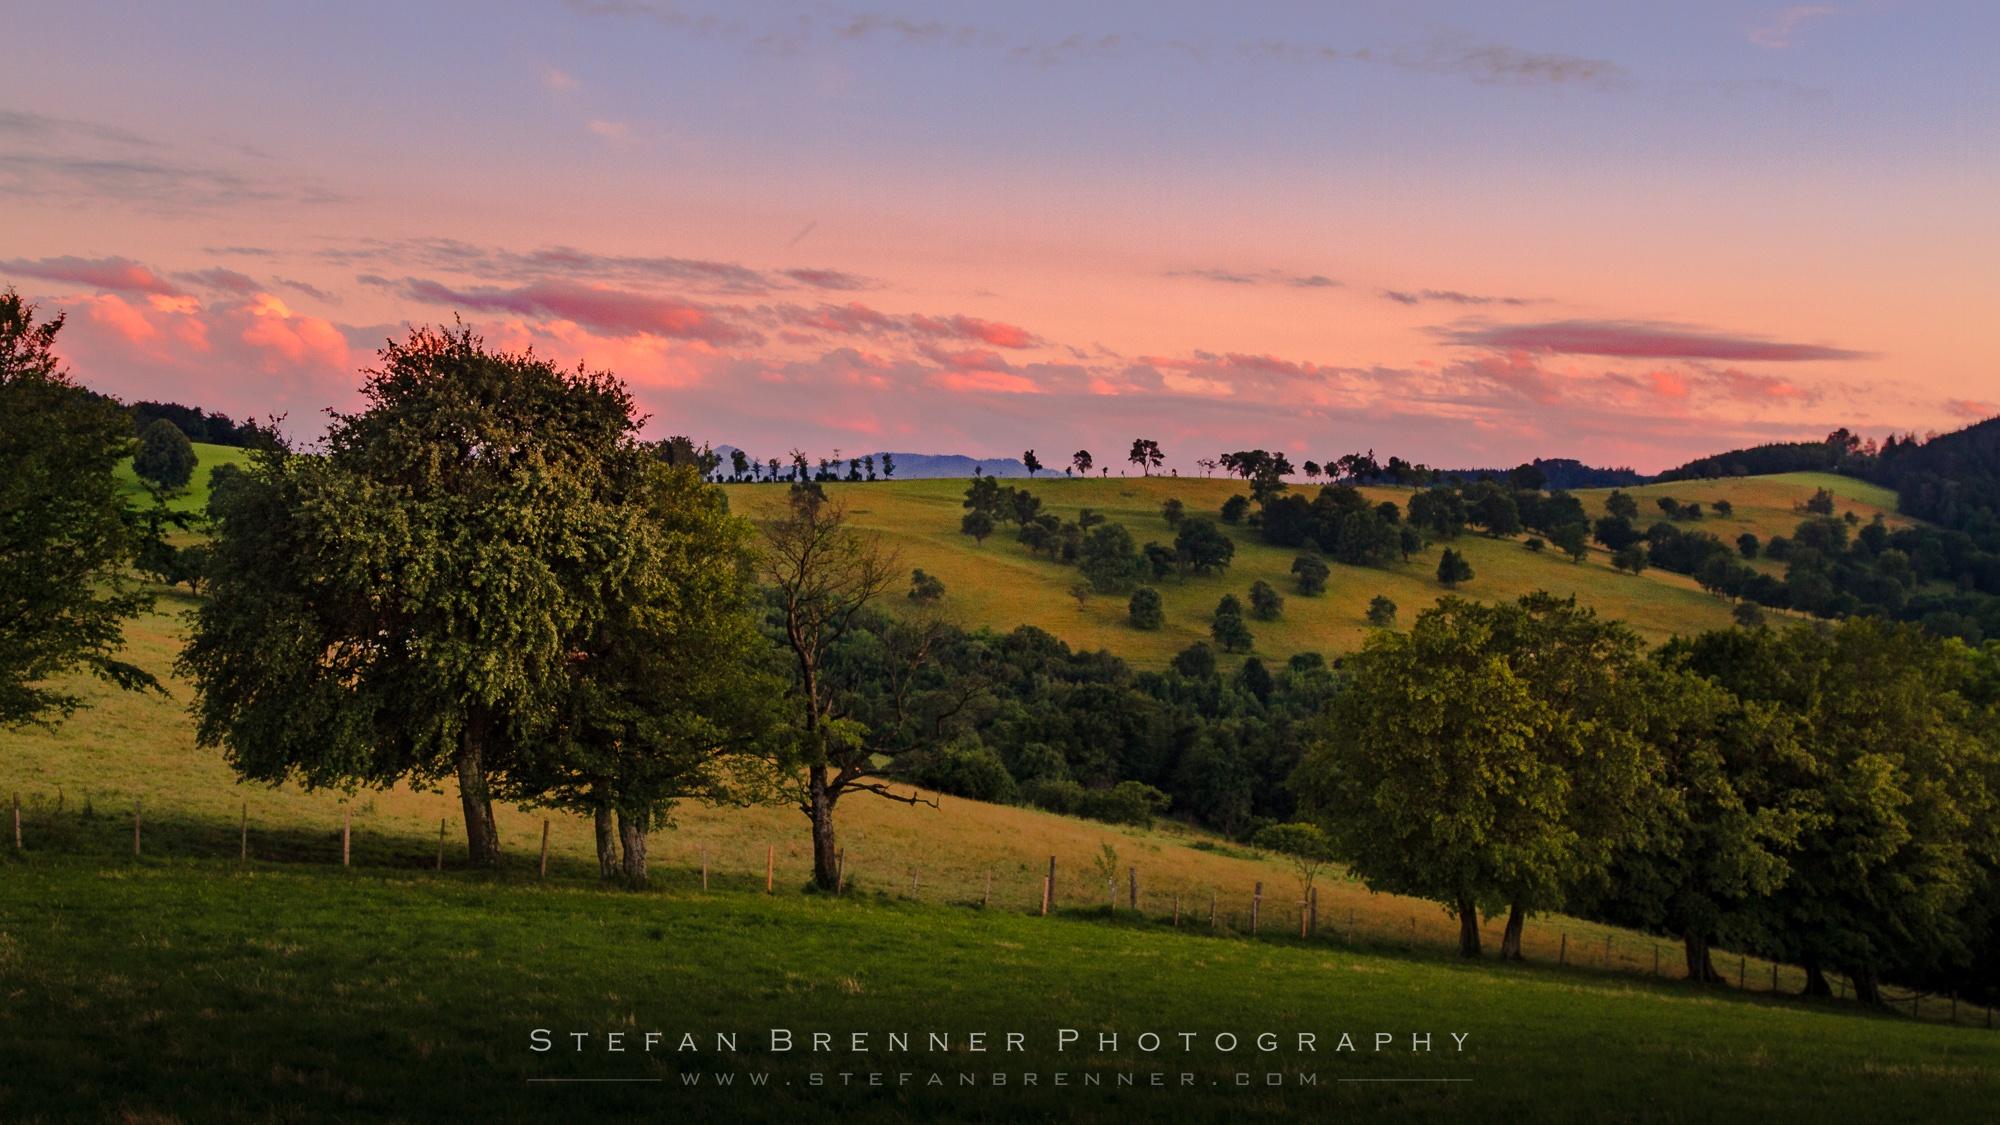 My Dreamland by Stefan Brenner